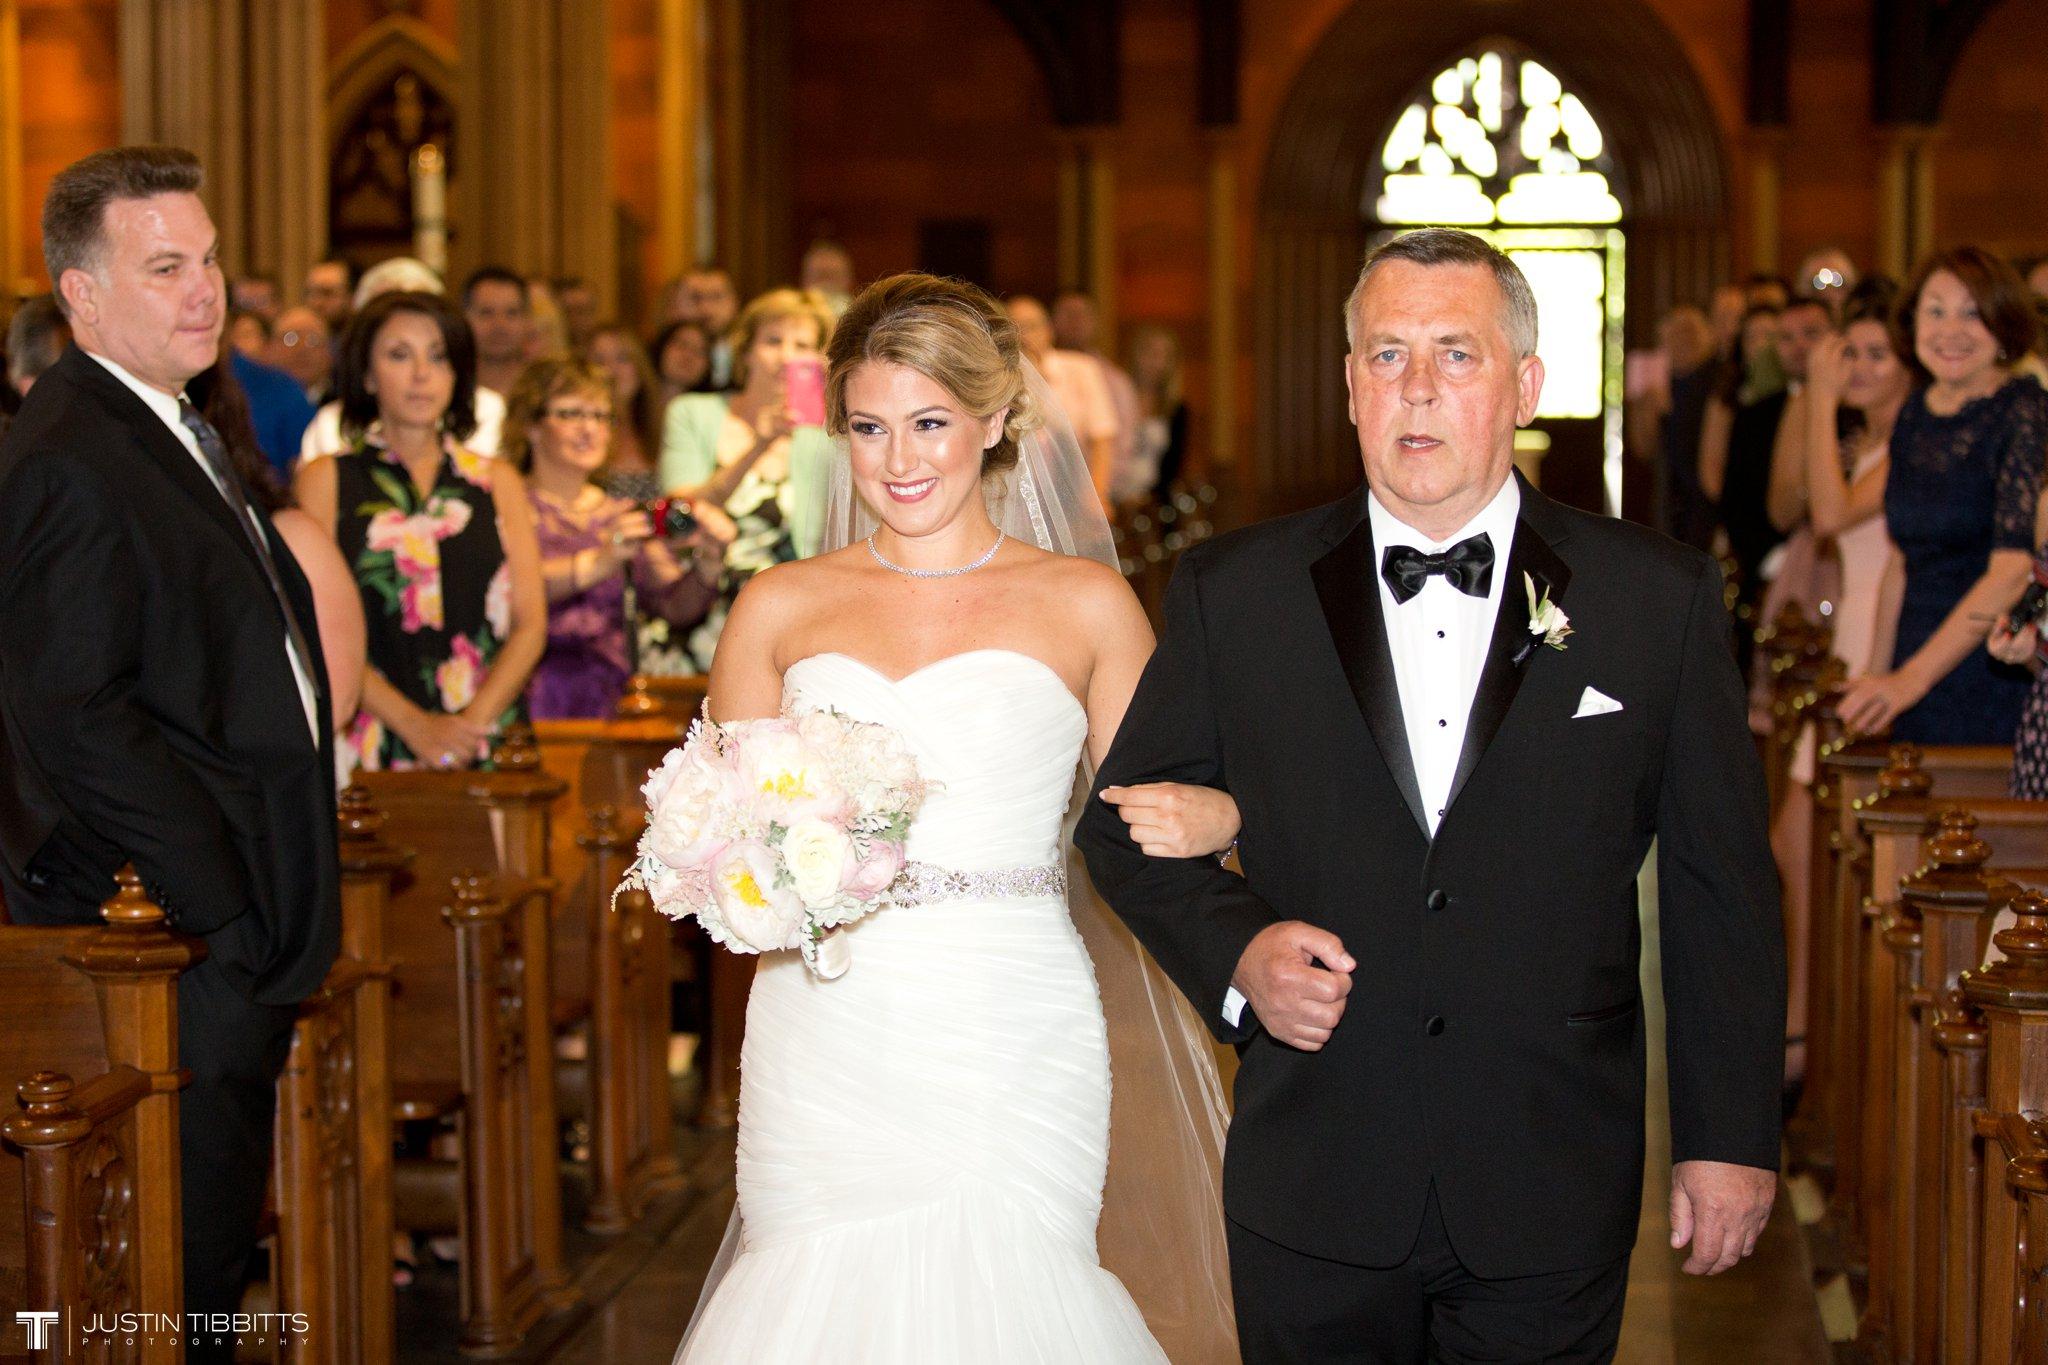 state-room-wedding-photos-with-amanda-and-nick_0078